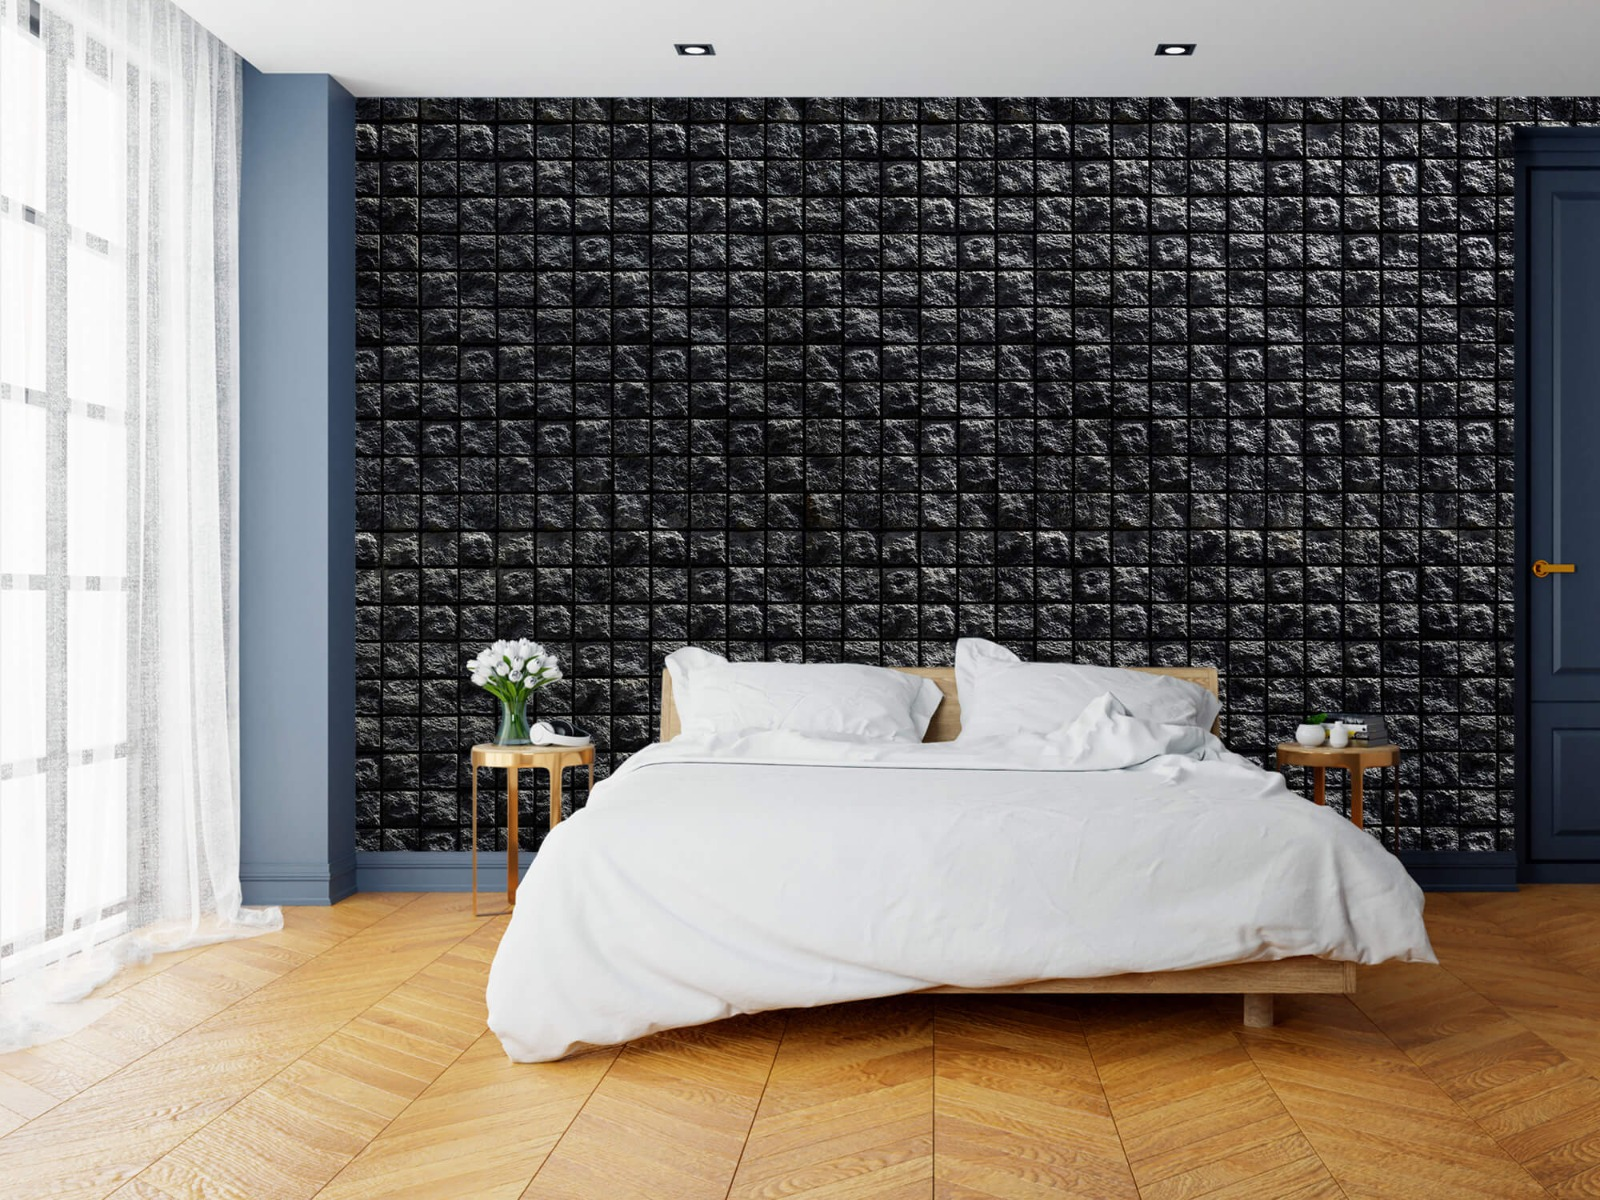 Tegel behang - Vierkante zwarte stenen - Wallexclusive - Woonkamer 15